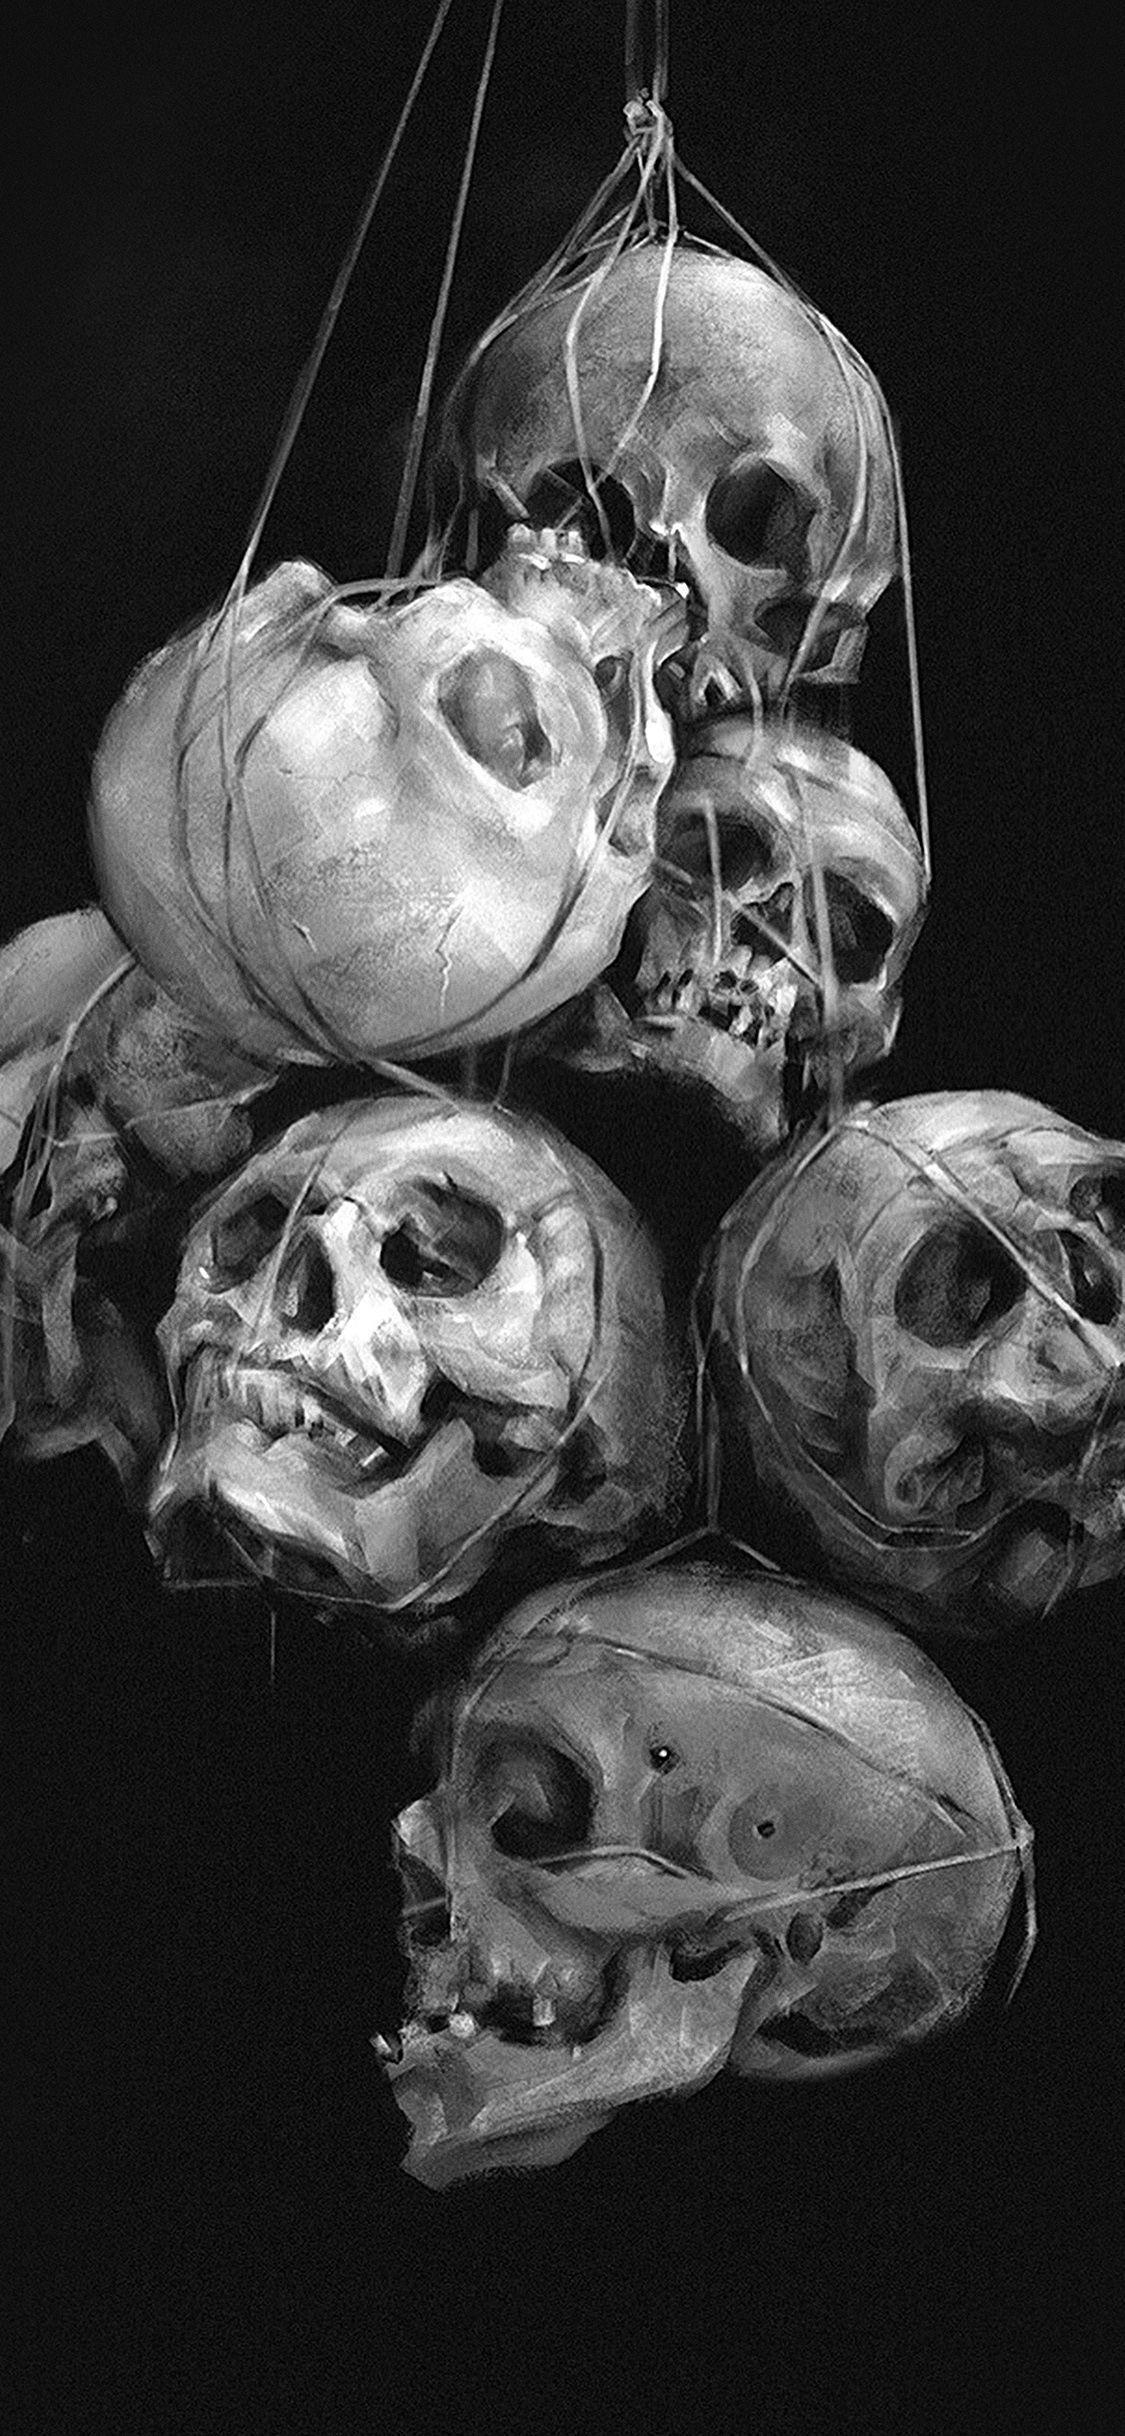 3d Skull Iphone Wallpapers Top Free 3d Skull Iphone